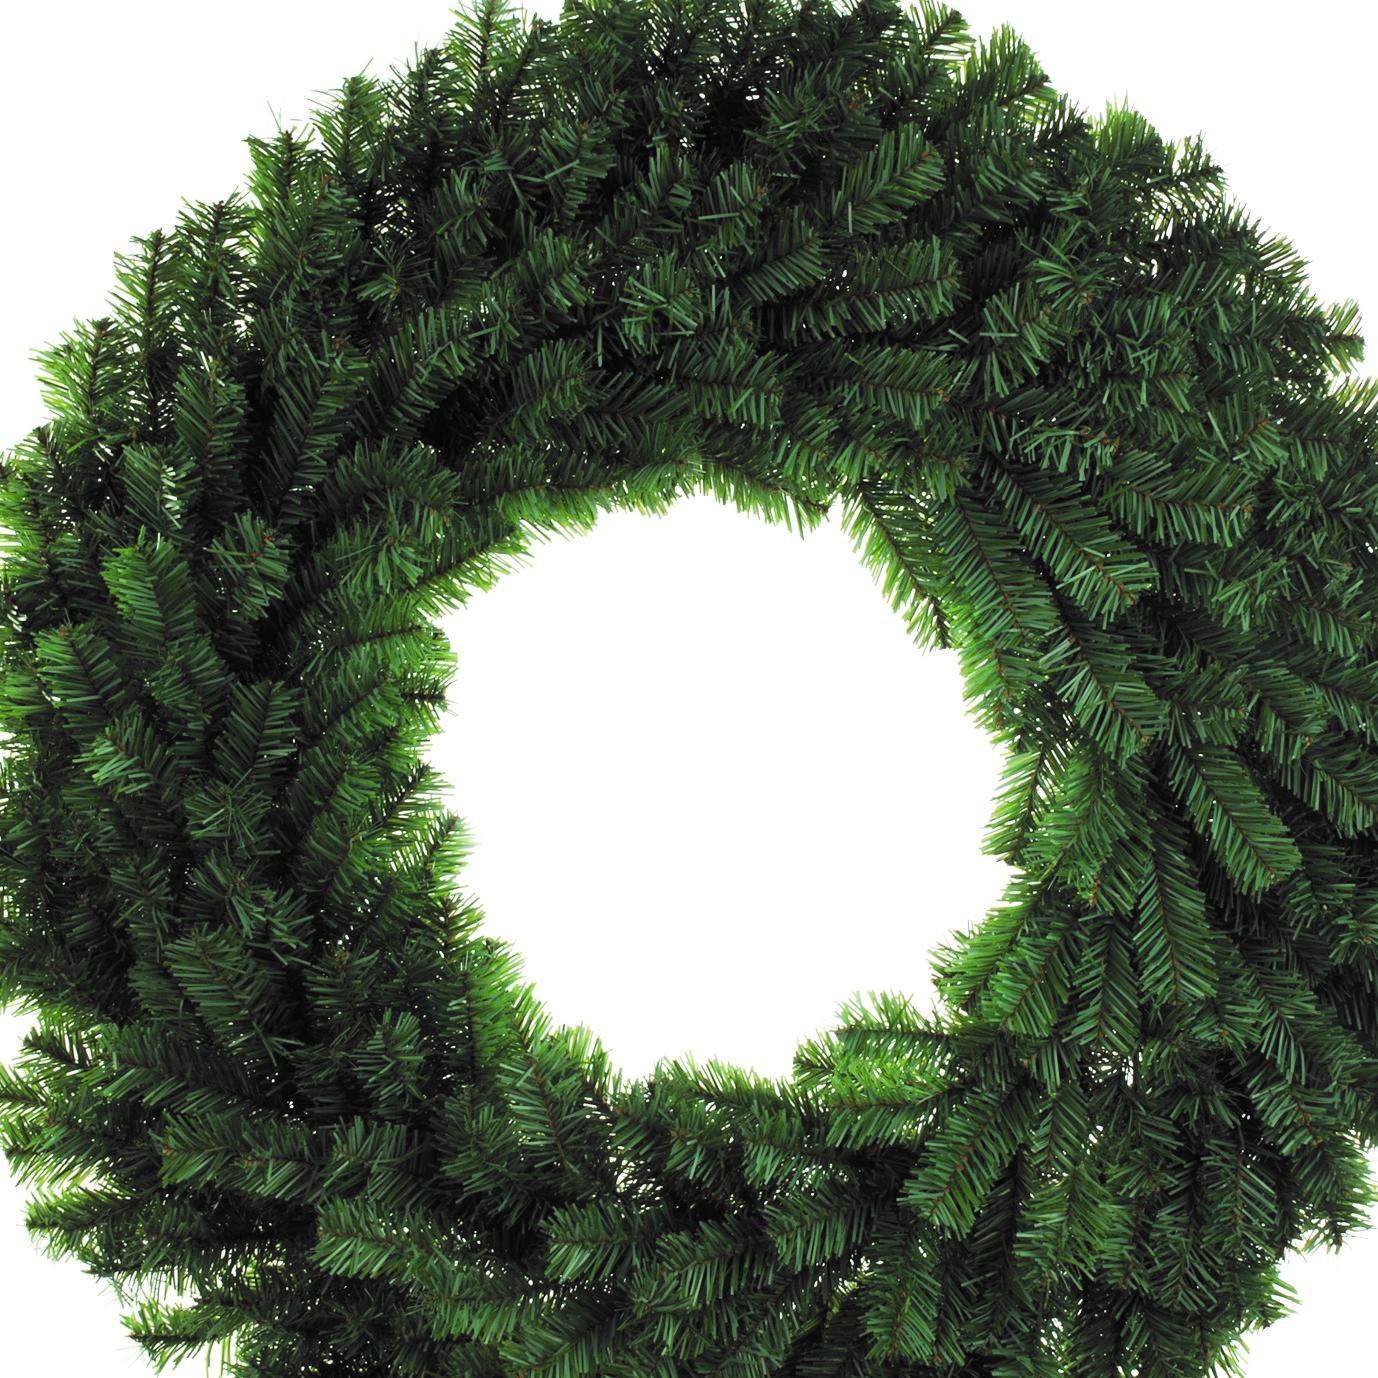 80cm Christmas Green Wreath